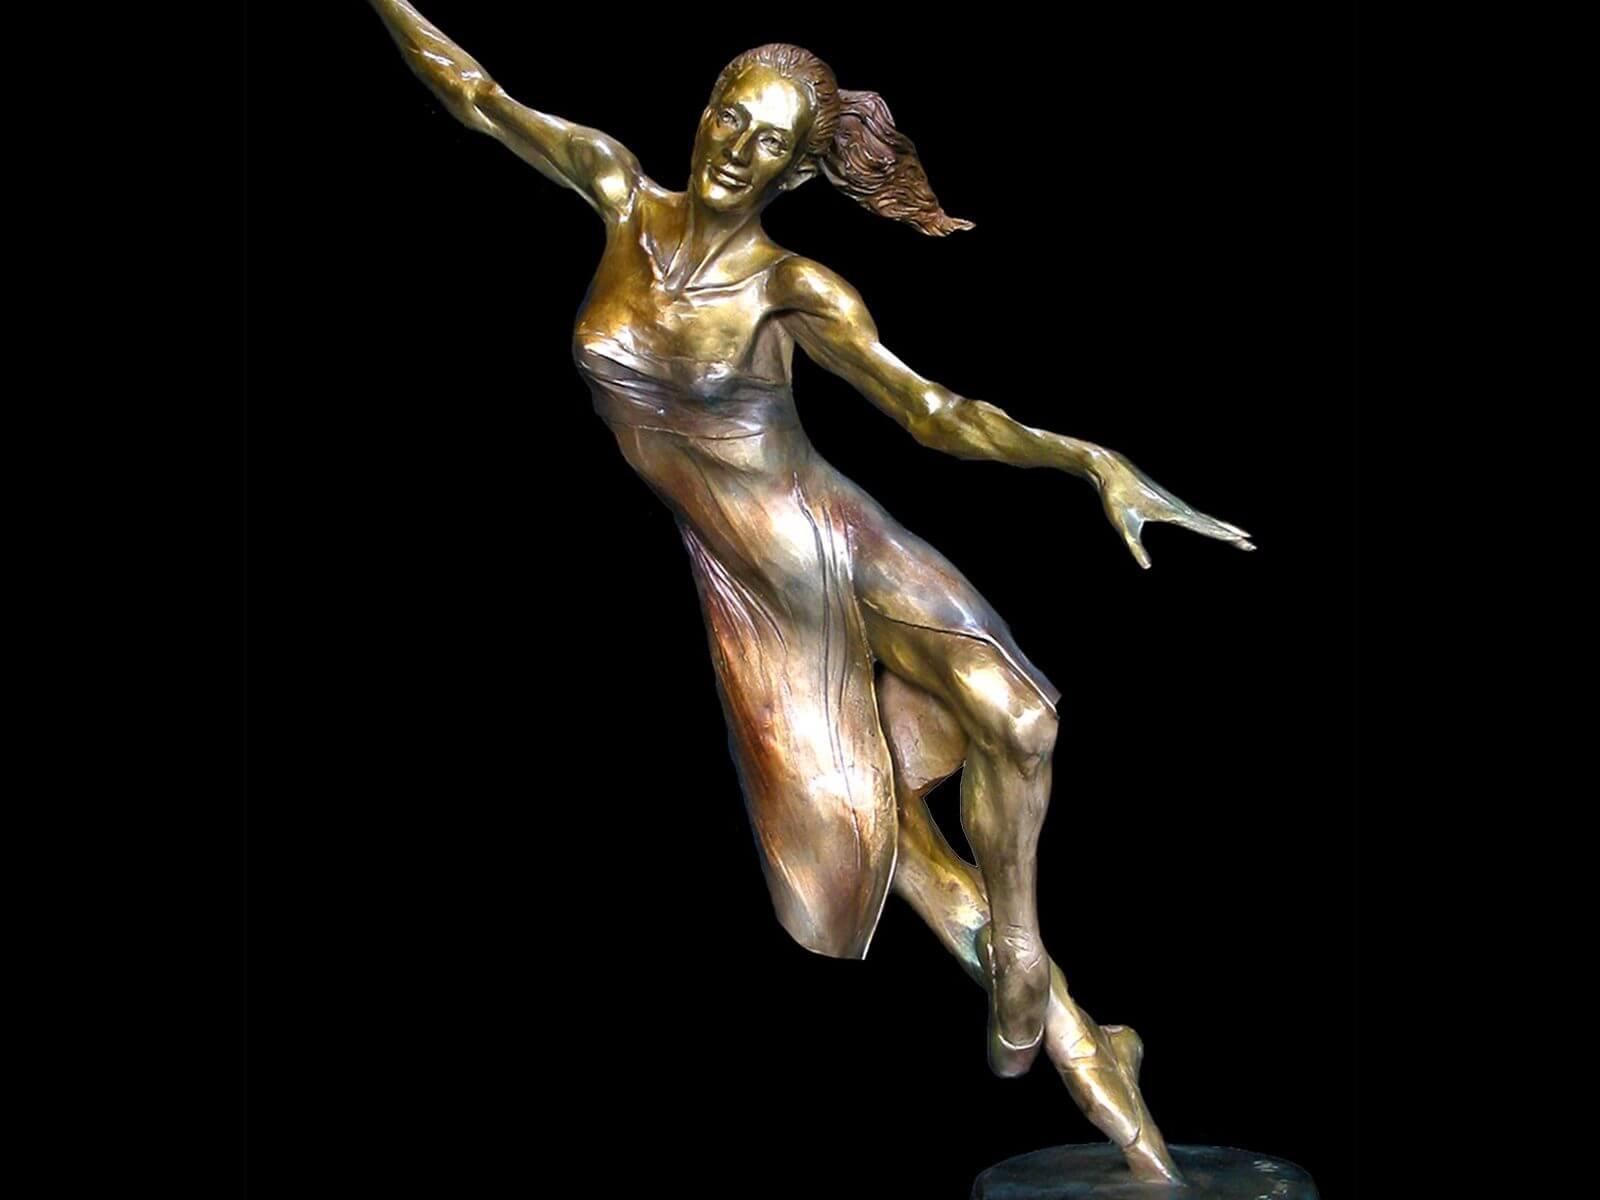 Moon beam a female ballet bronze dance sculpture by sculptor Andrew DeVries